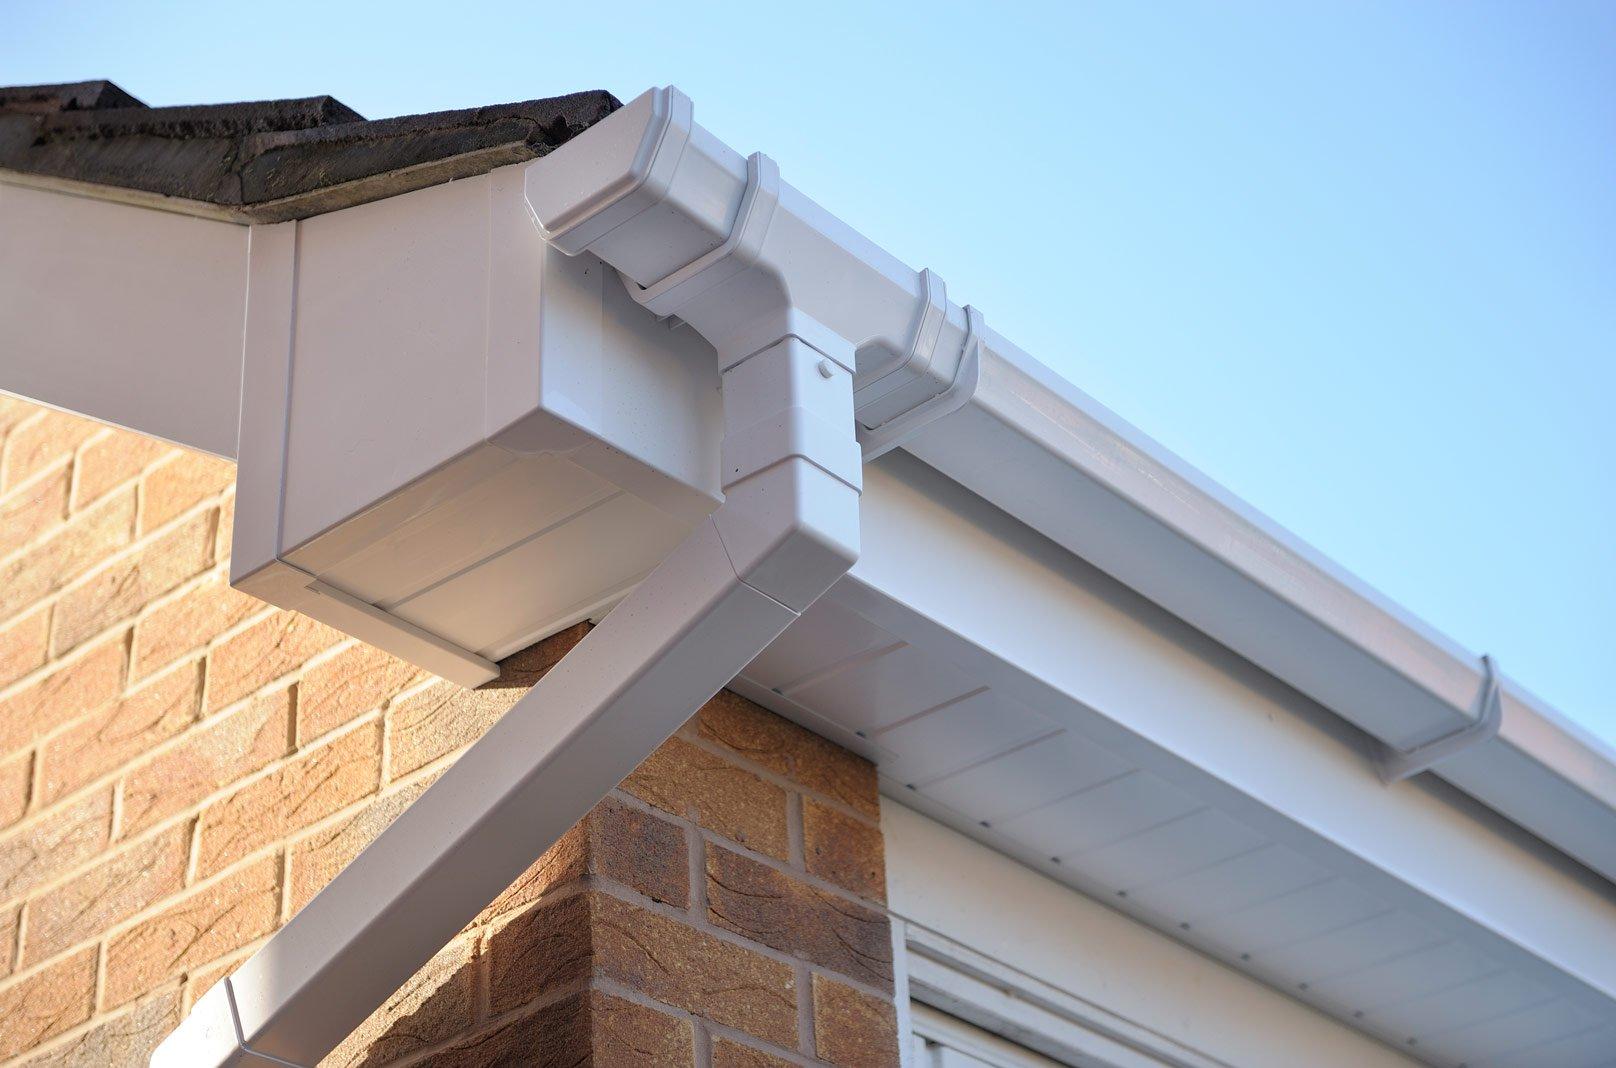 Cladding Southend Fascias Soffits Guttering Windows